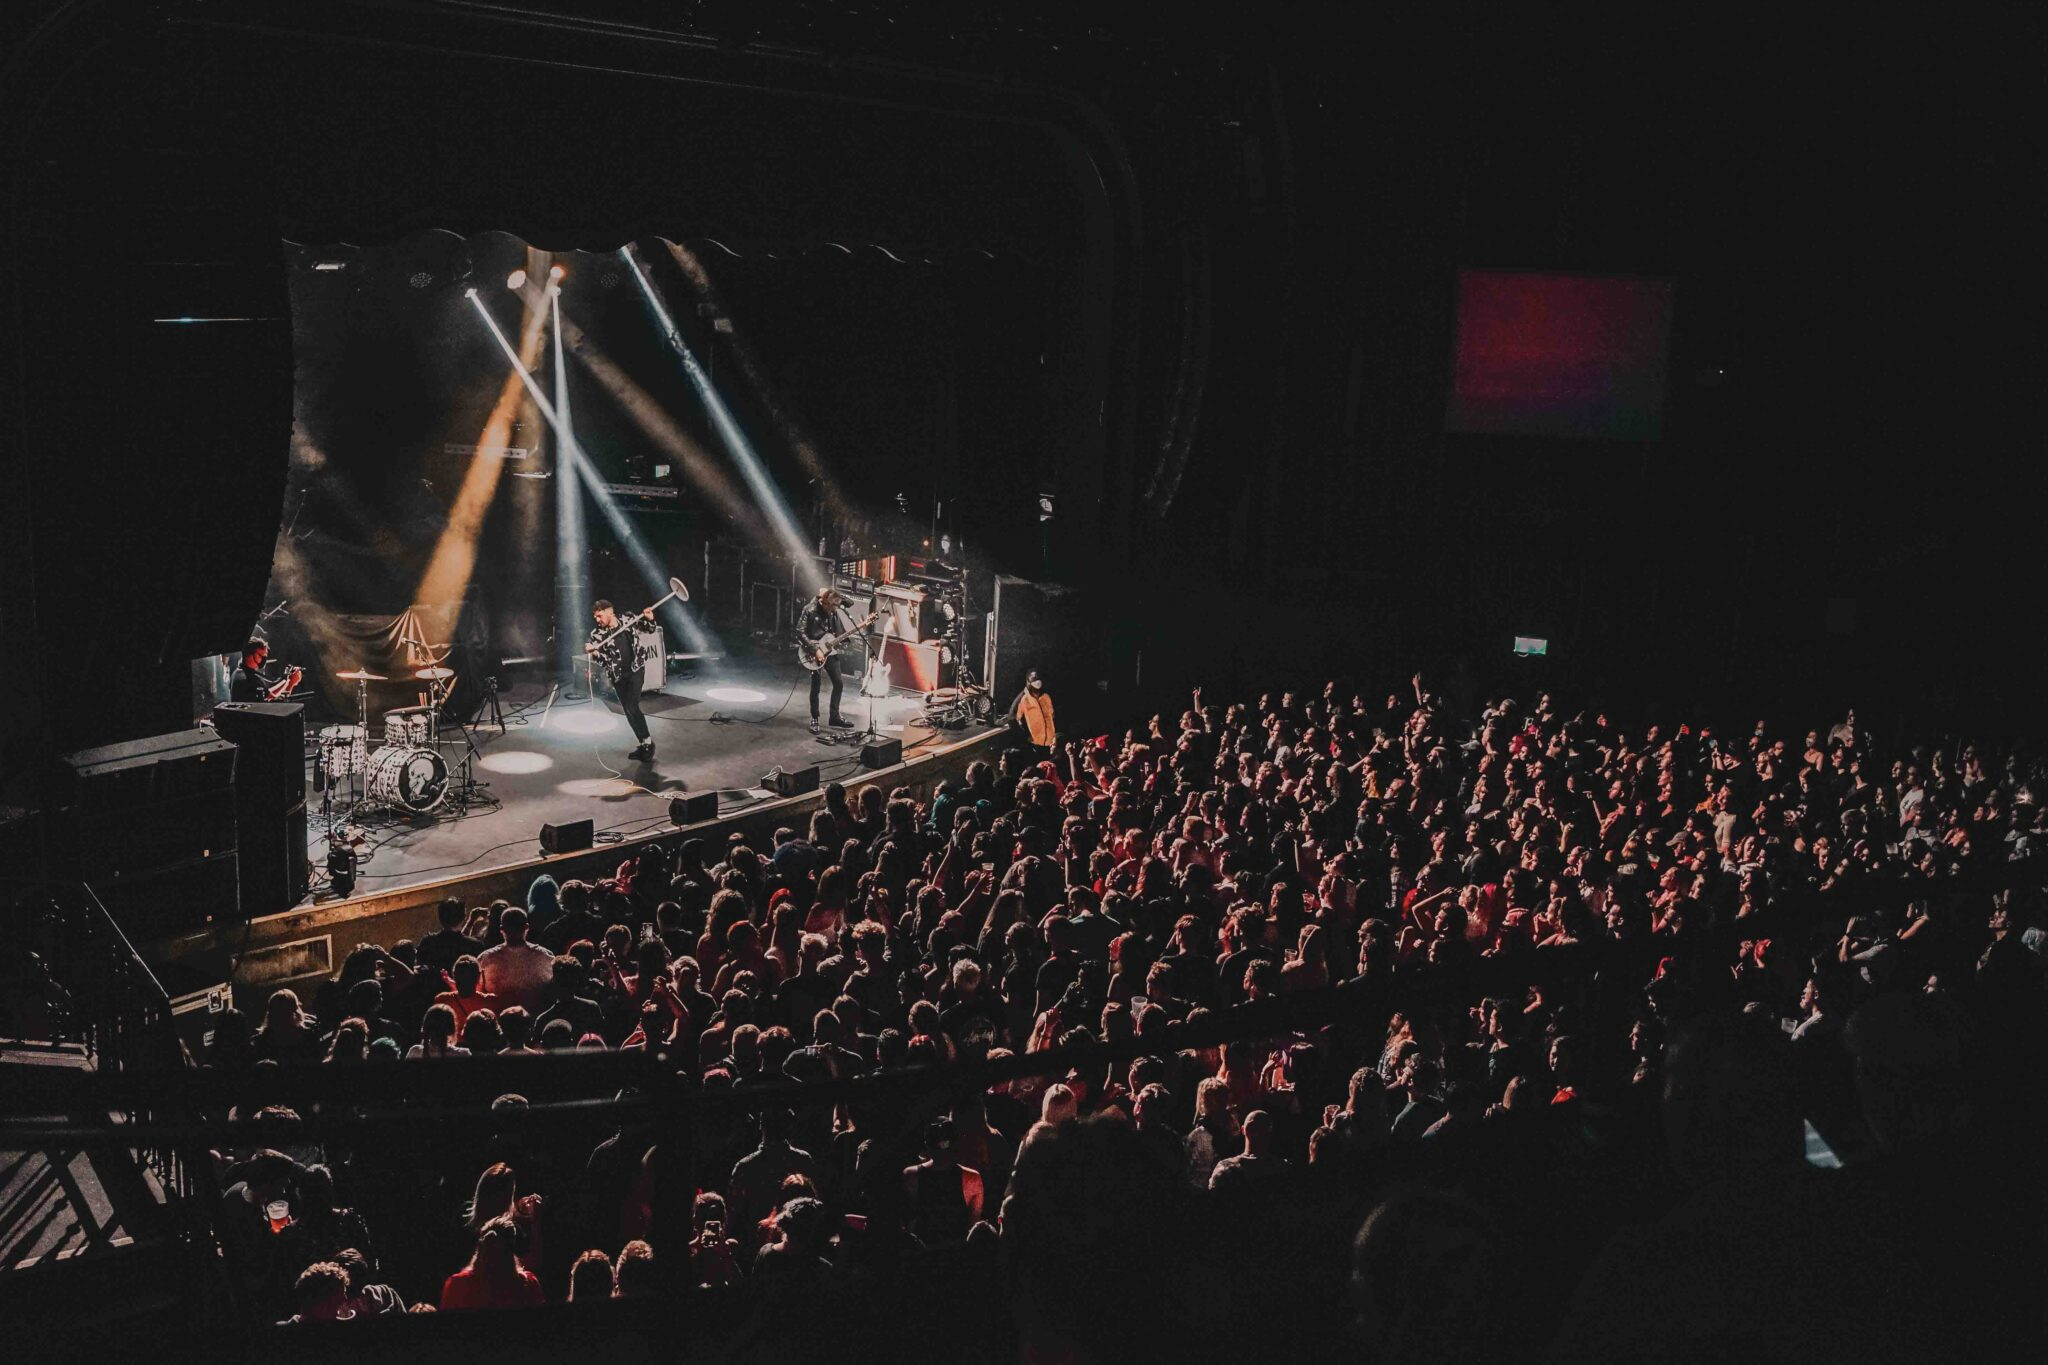 Saint PHNX performing live - Photo by Ben Stapleton